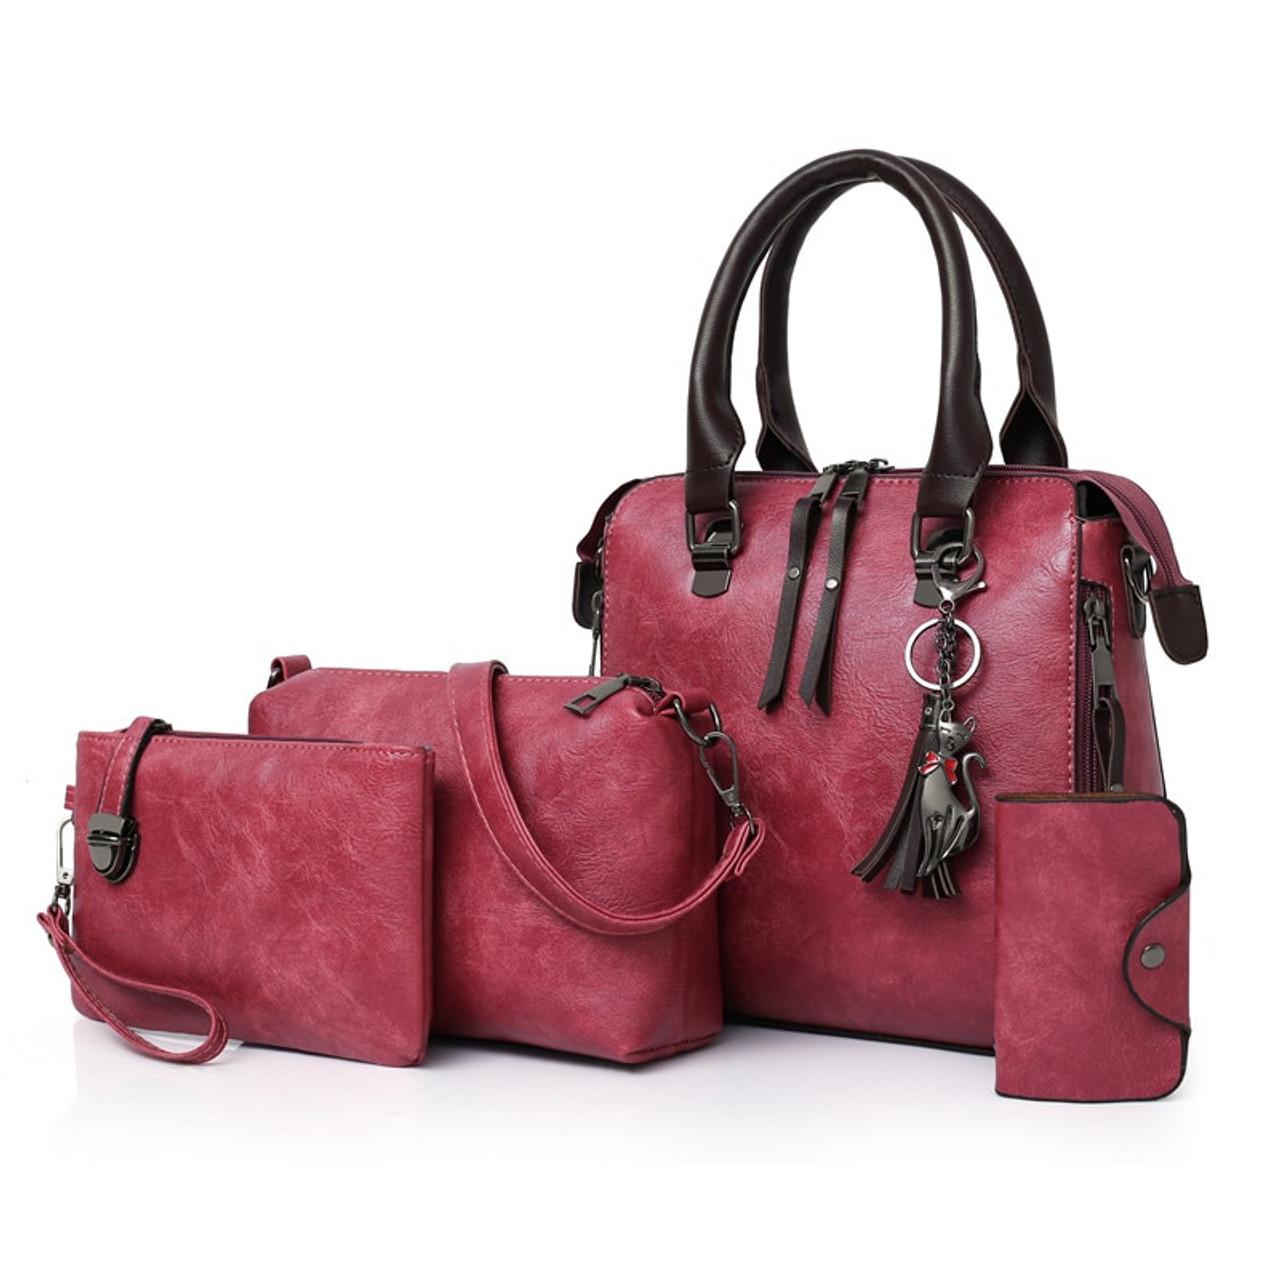 1656c66e08 ... Four sets wax oil pu leather bag ladies handbags women handbag designer  handbag tasse lhigh quality ...